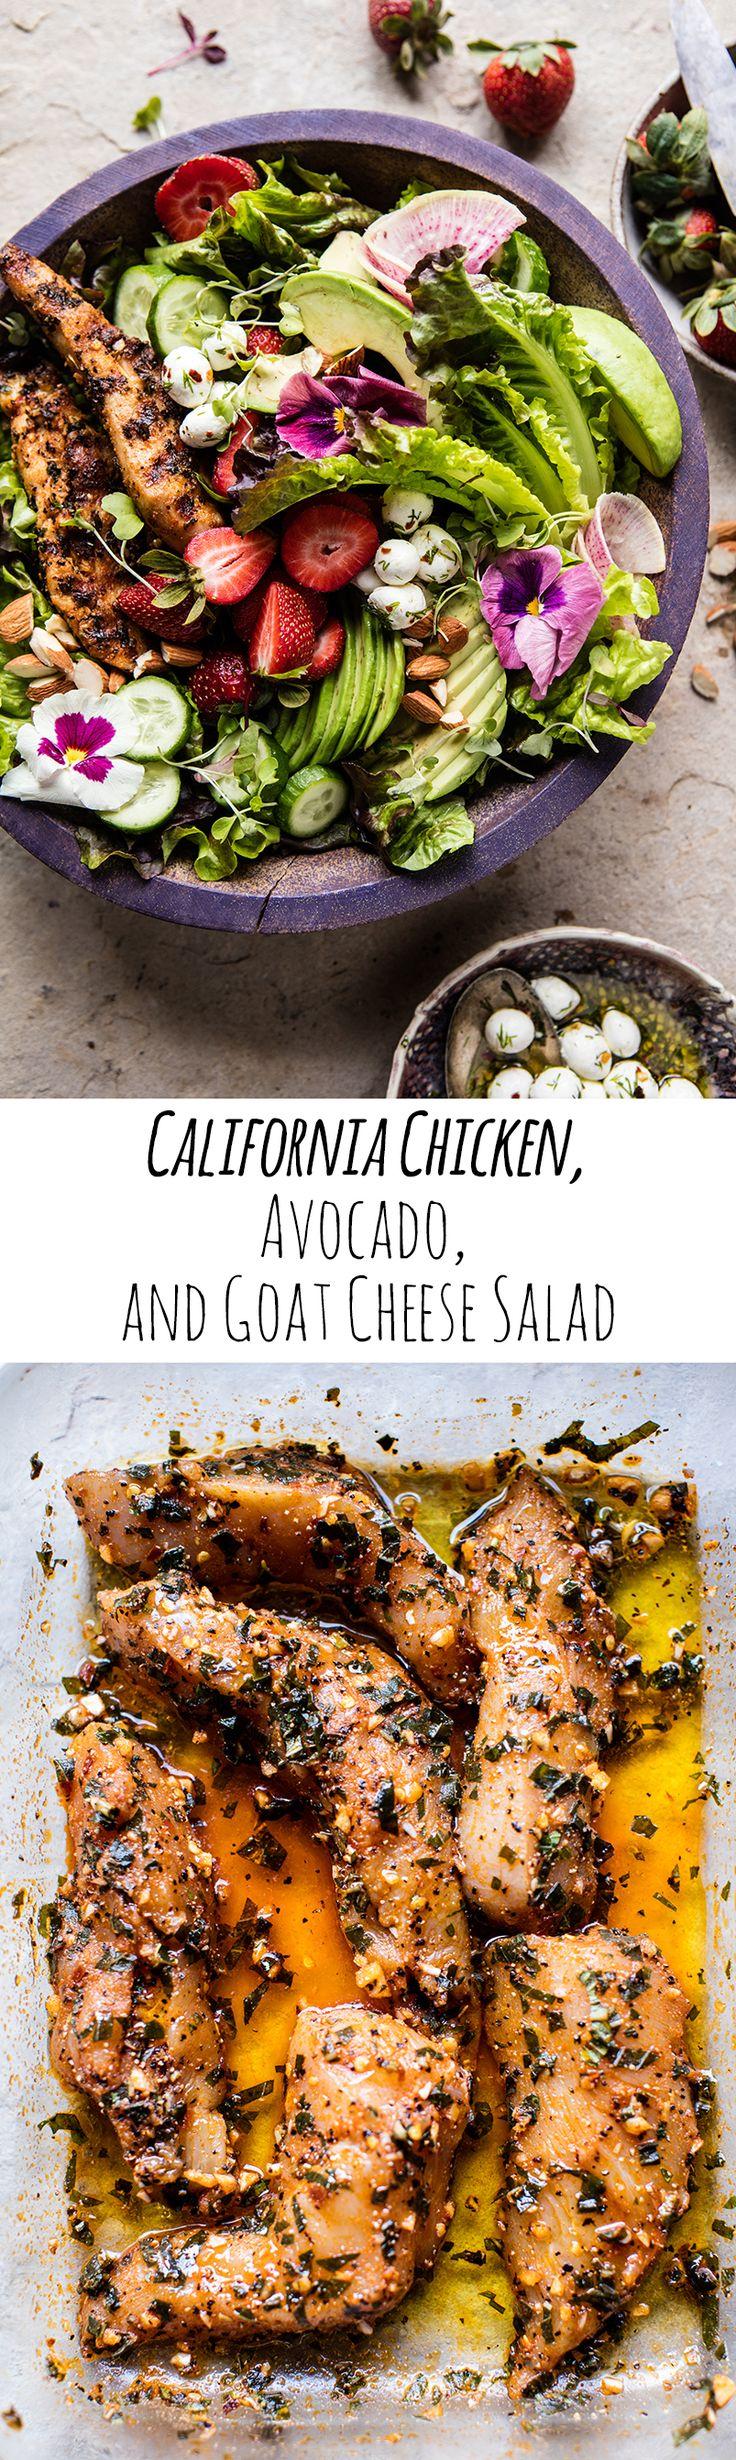 California Chicken, Avocado, and Goat Cheese Salad | halfbakedharvest.com @hbharvest